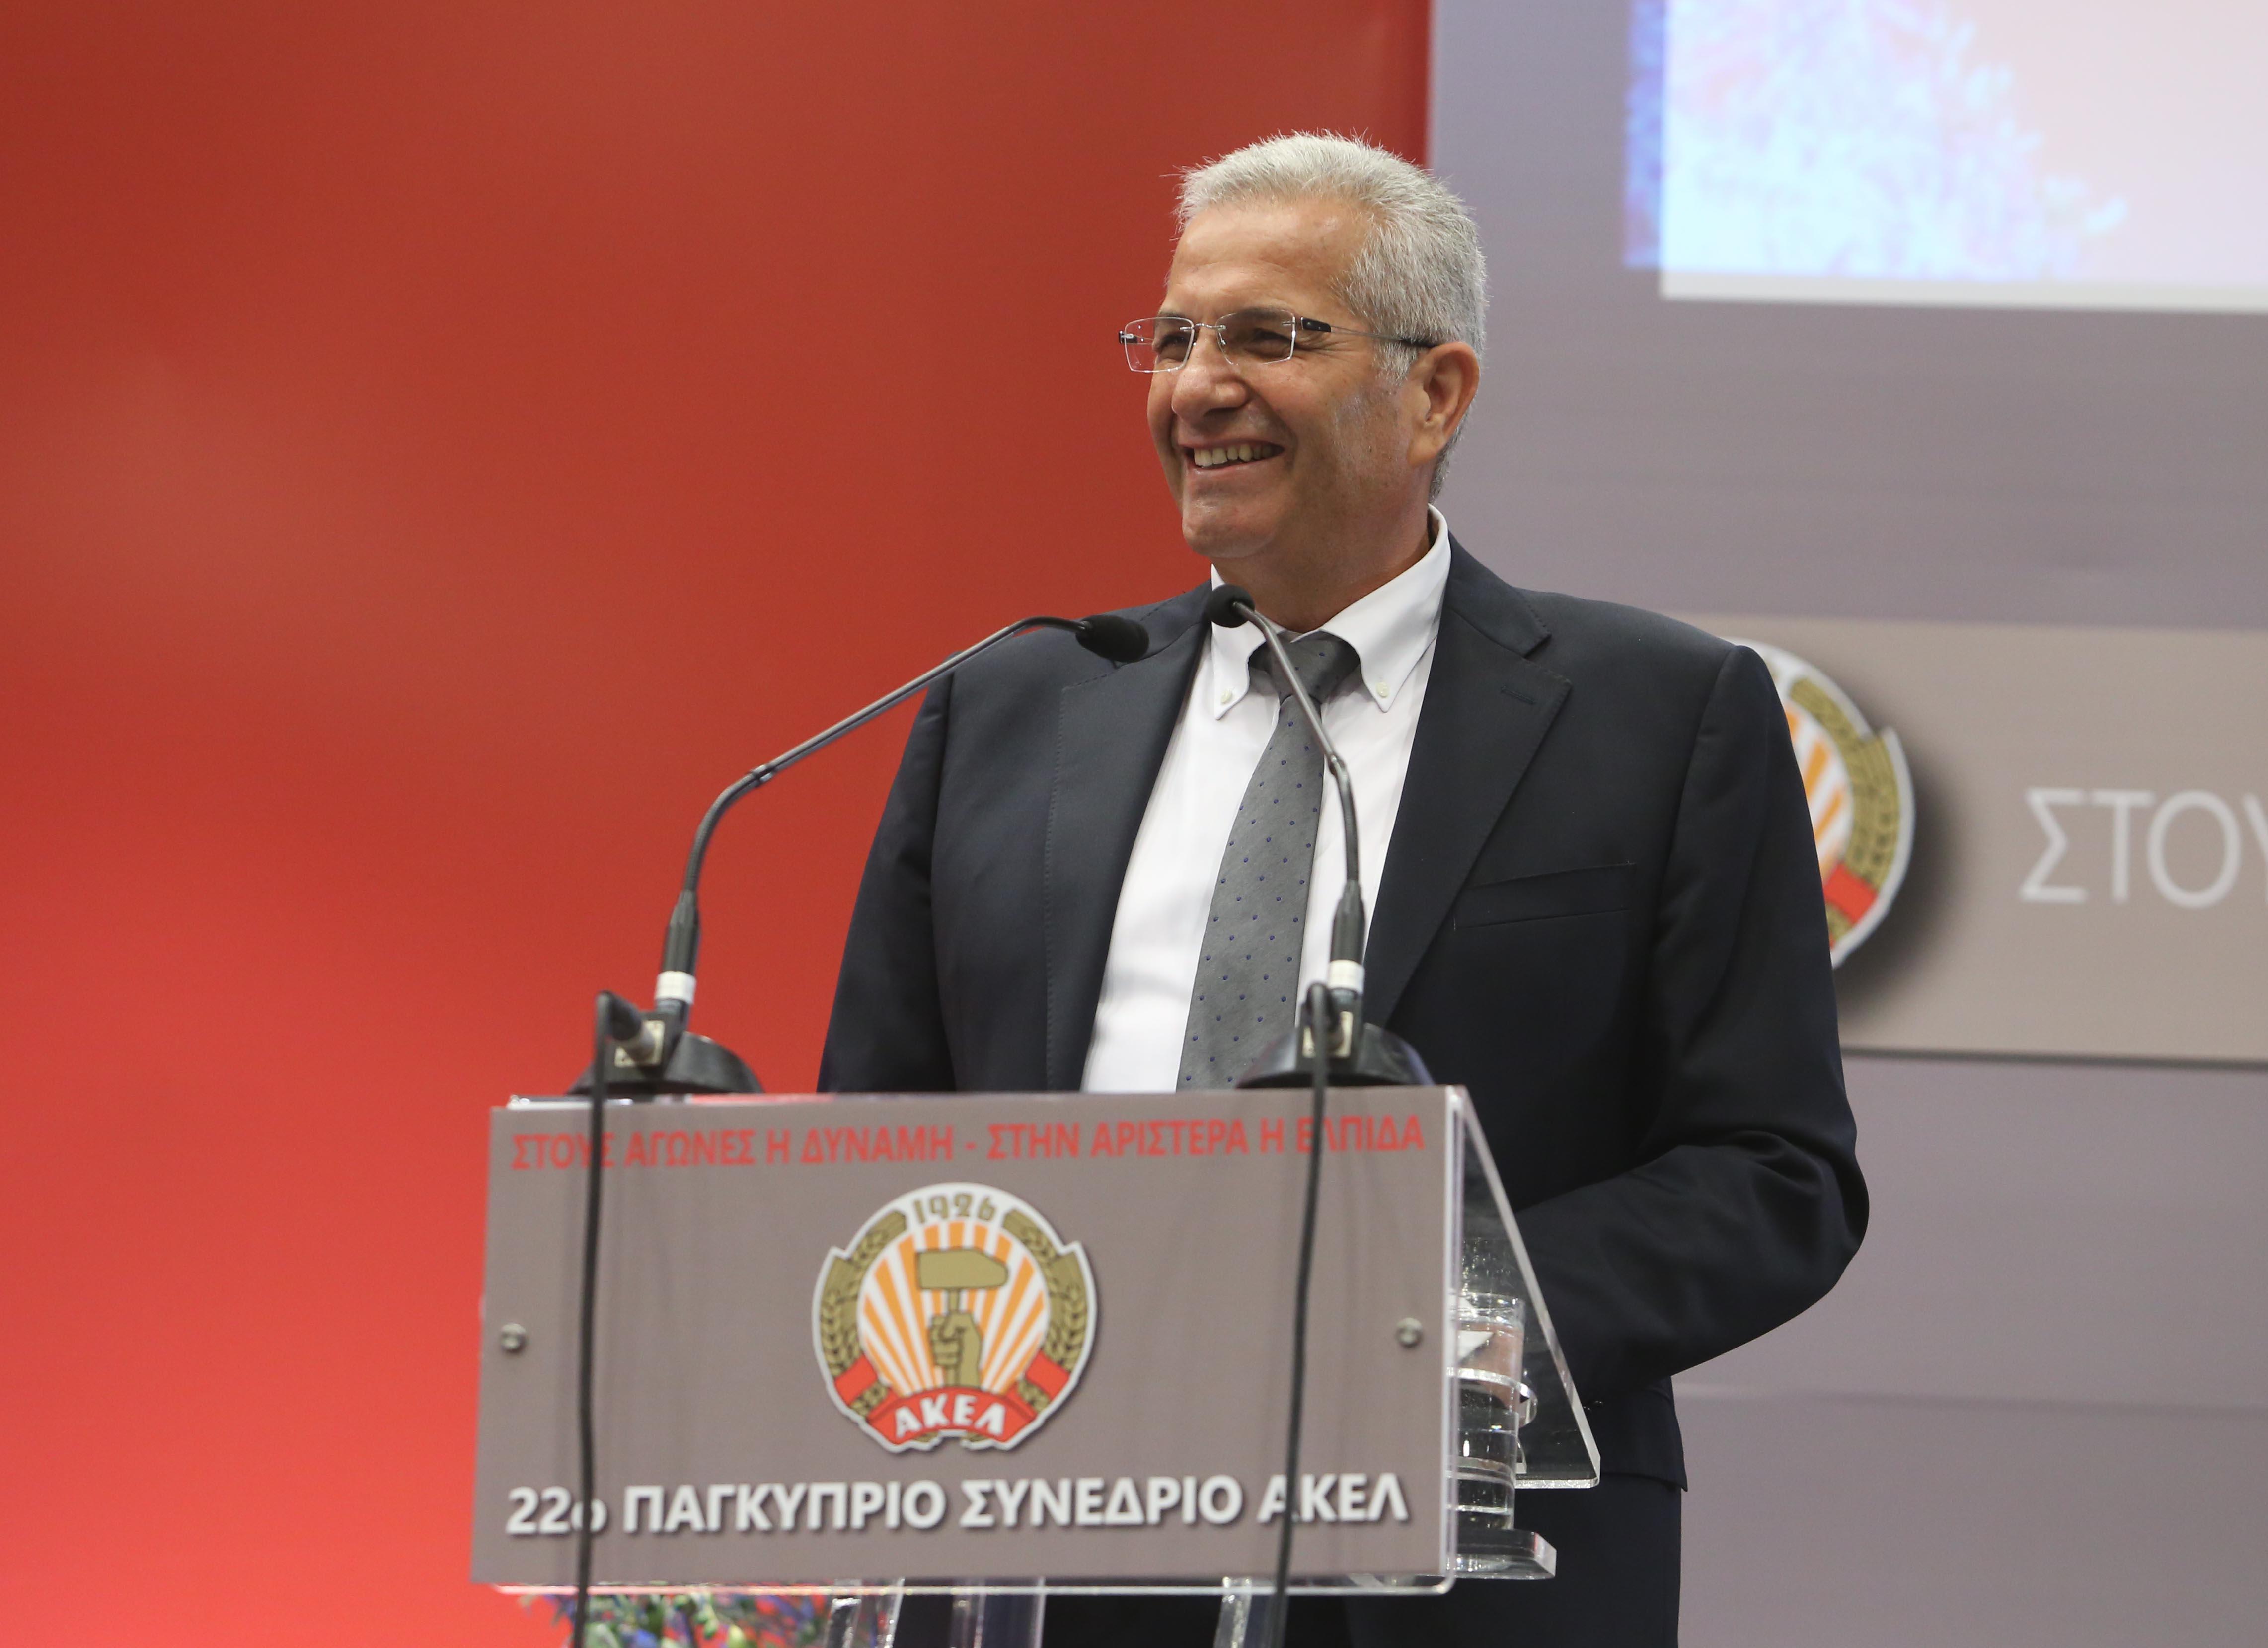 gg akel γγ ακελ akyprianou